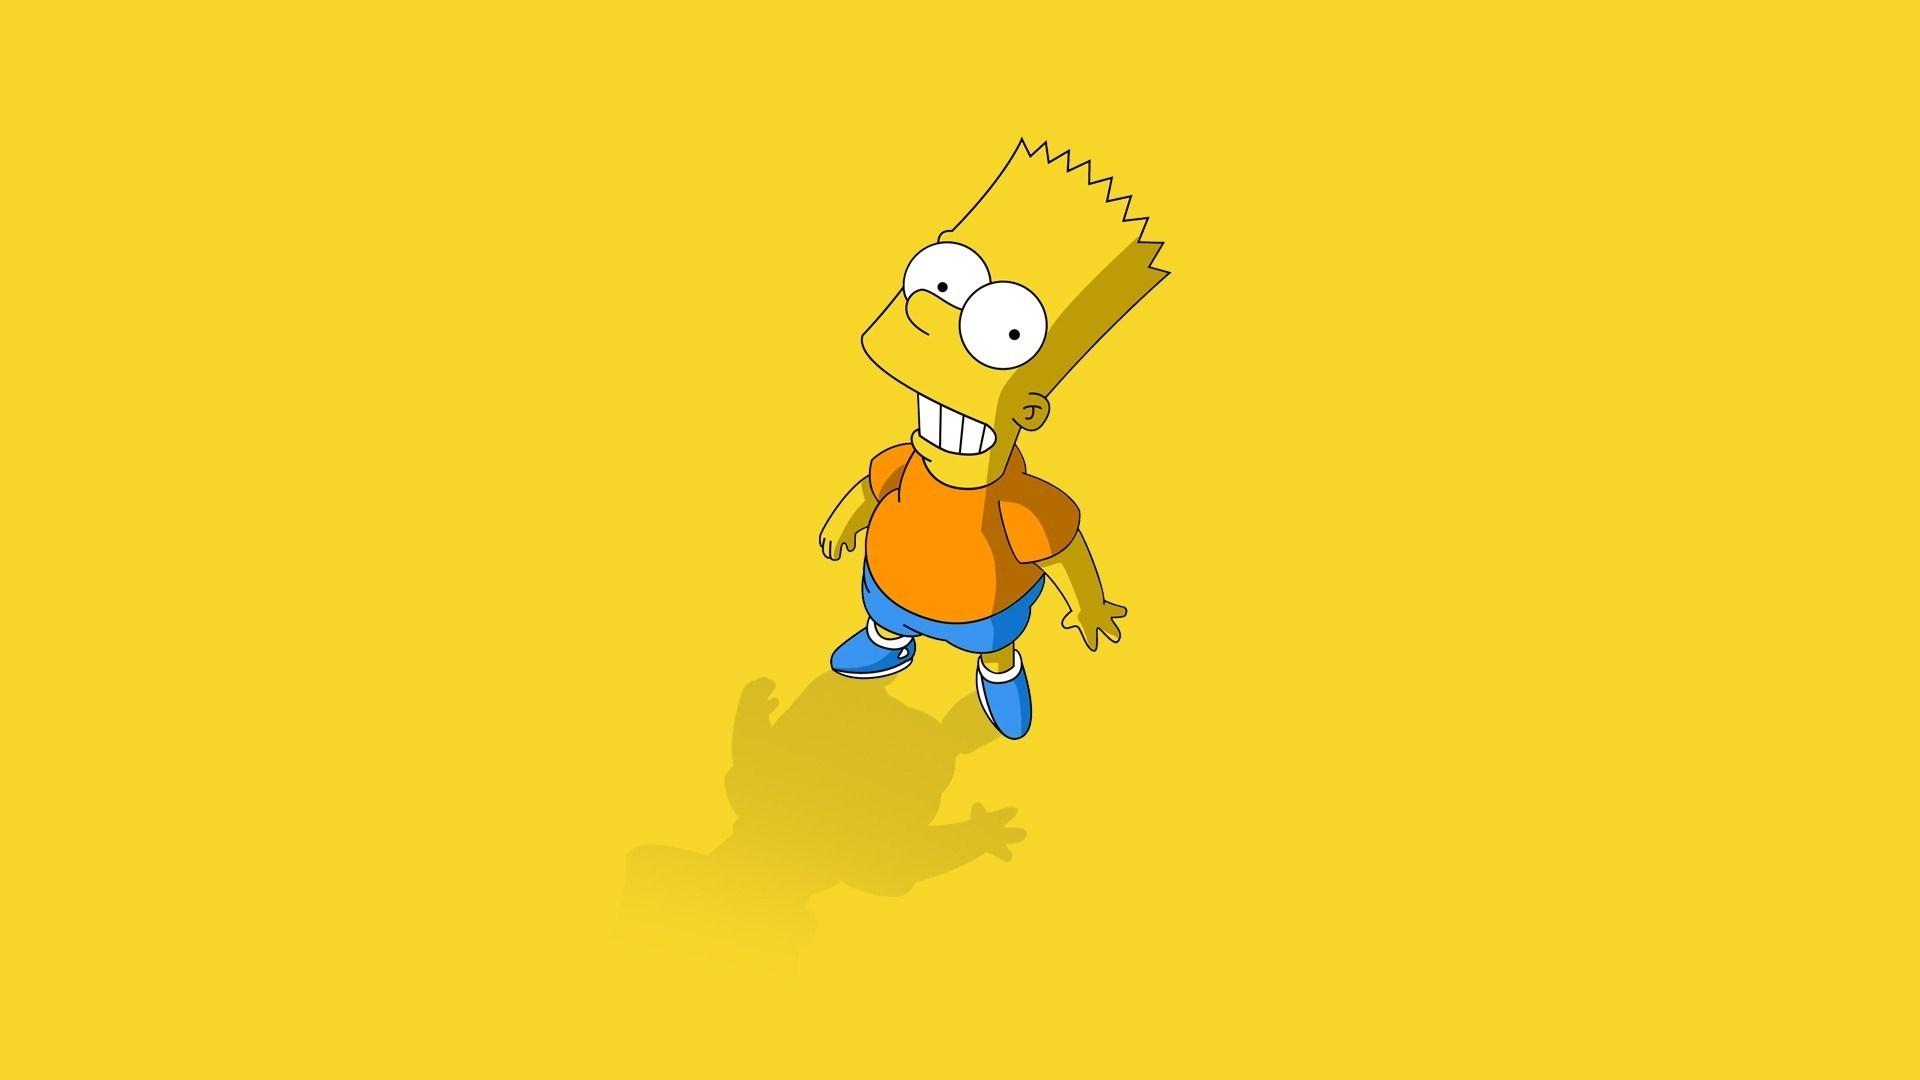 The Simpsons Wallpaper 26 Wallpapersbq